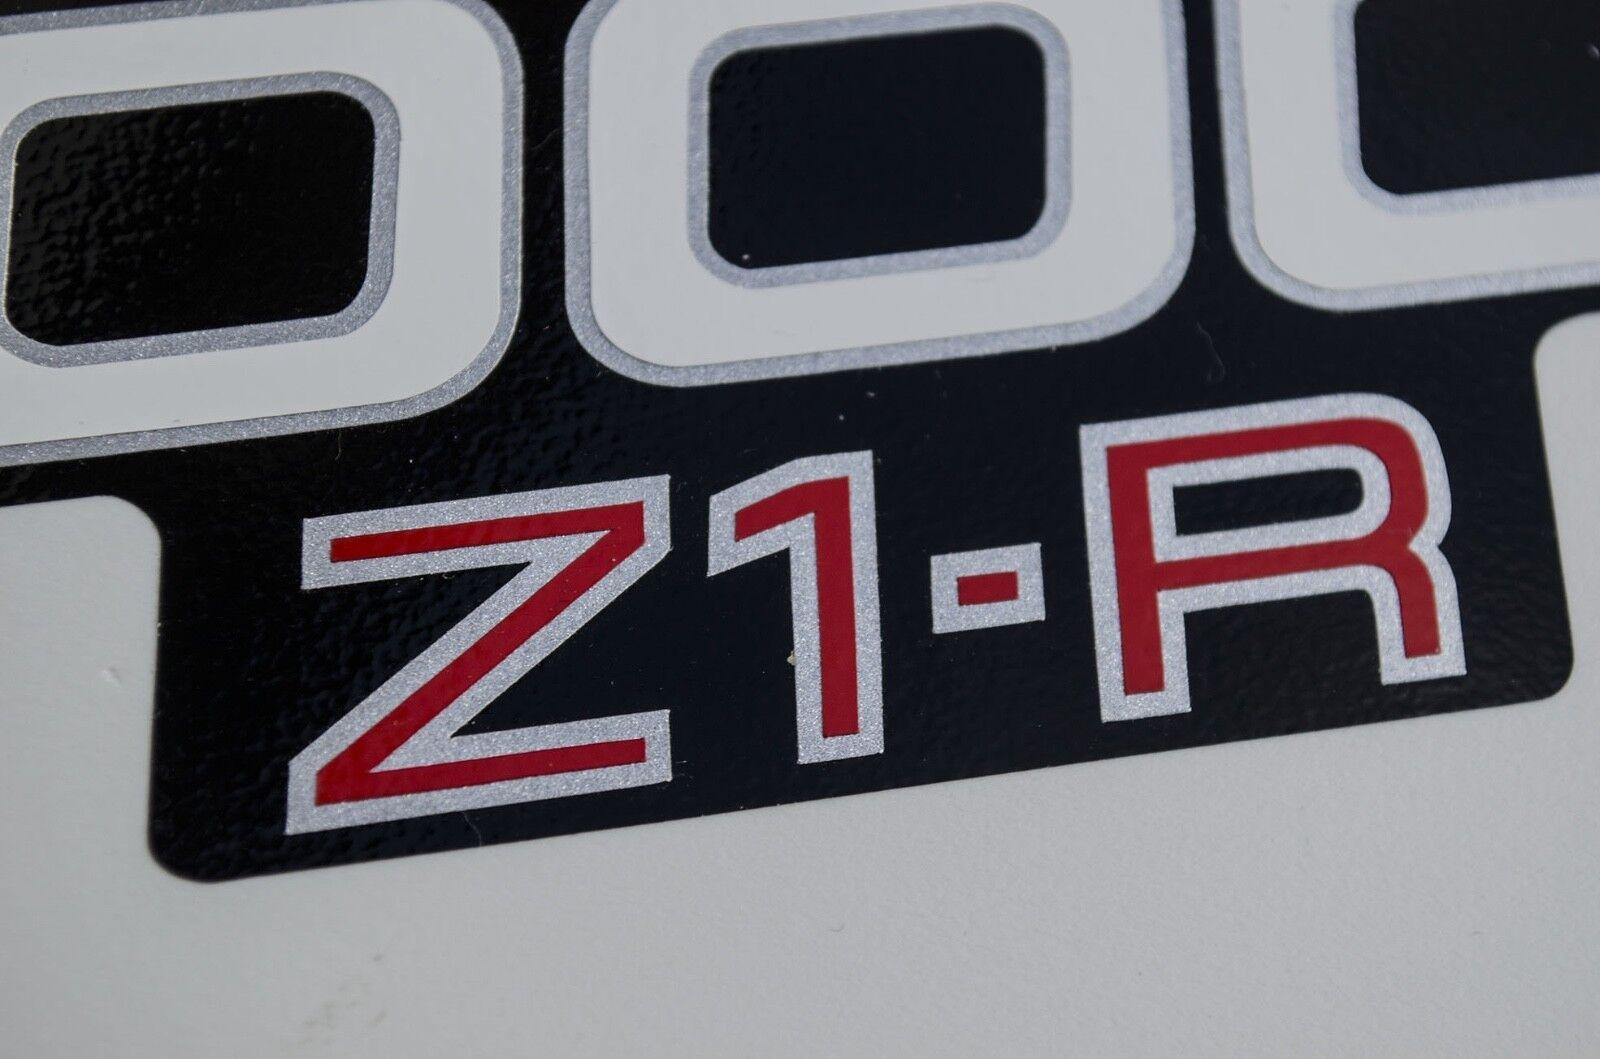 Kawasaki Z 1000 Z2-R Seitendeckel Emblem Aufkleber Decals 2 Stück